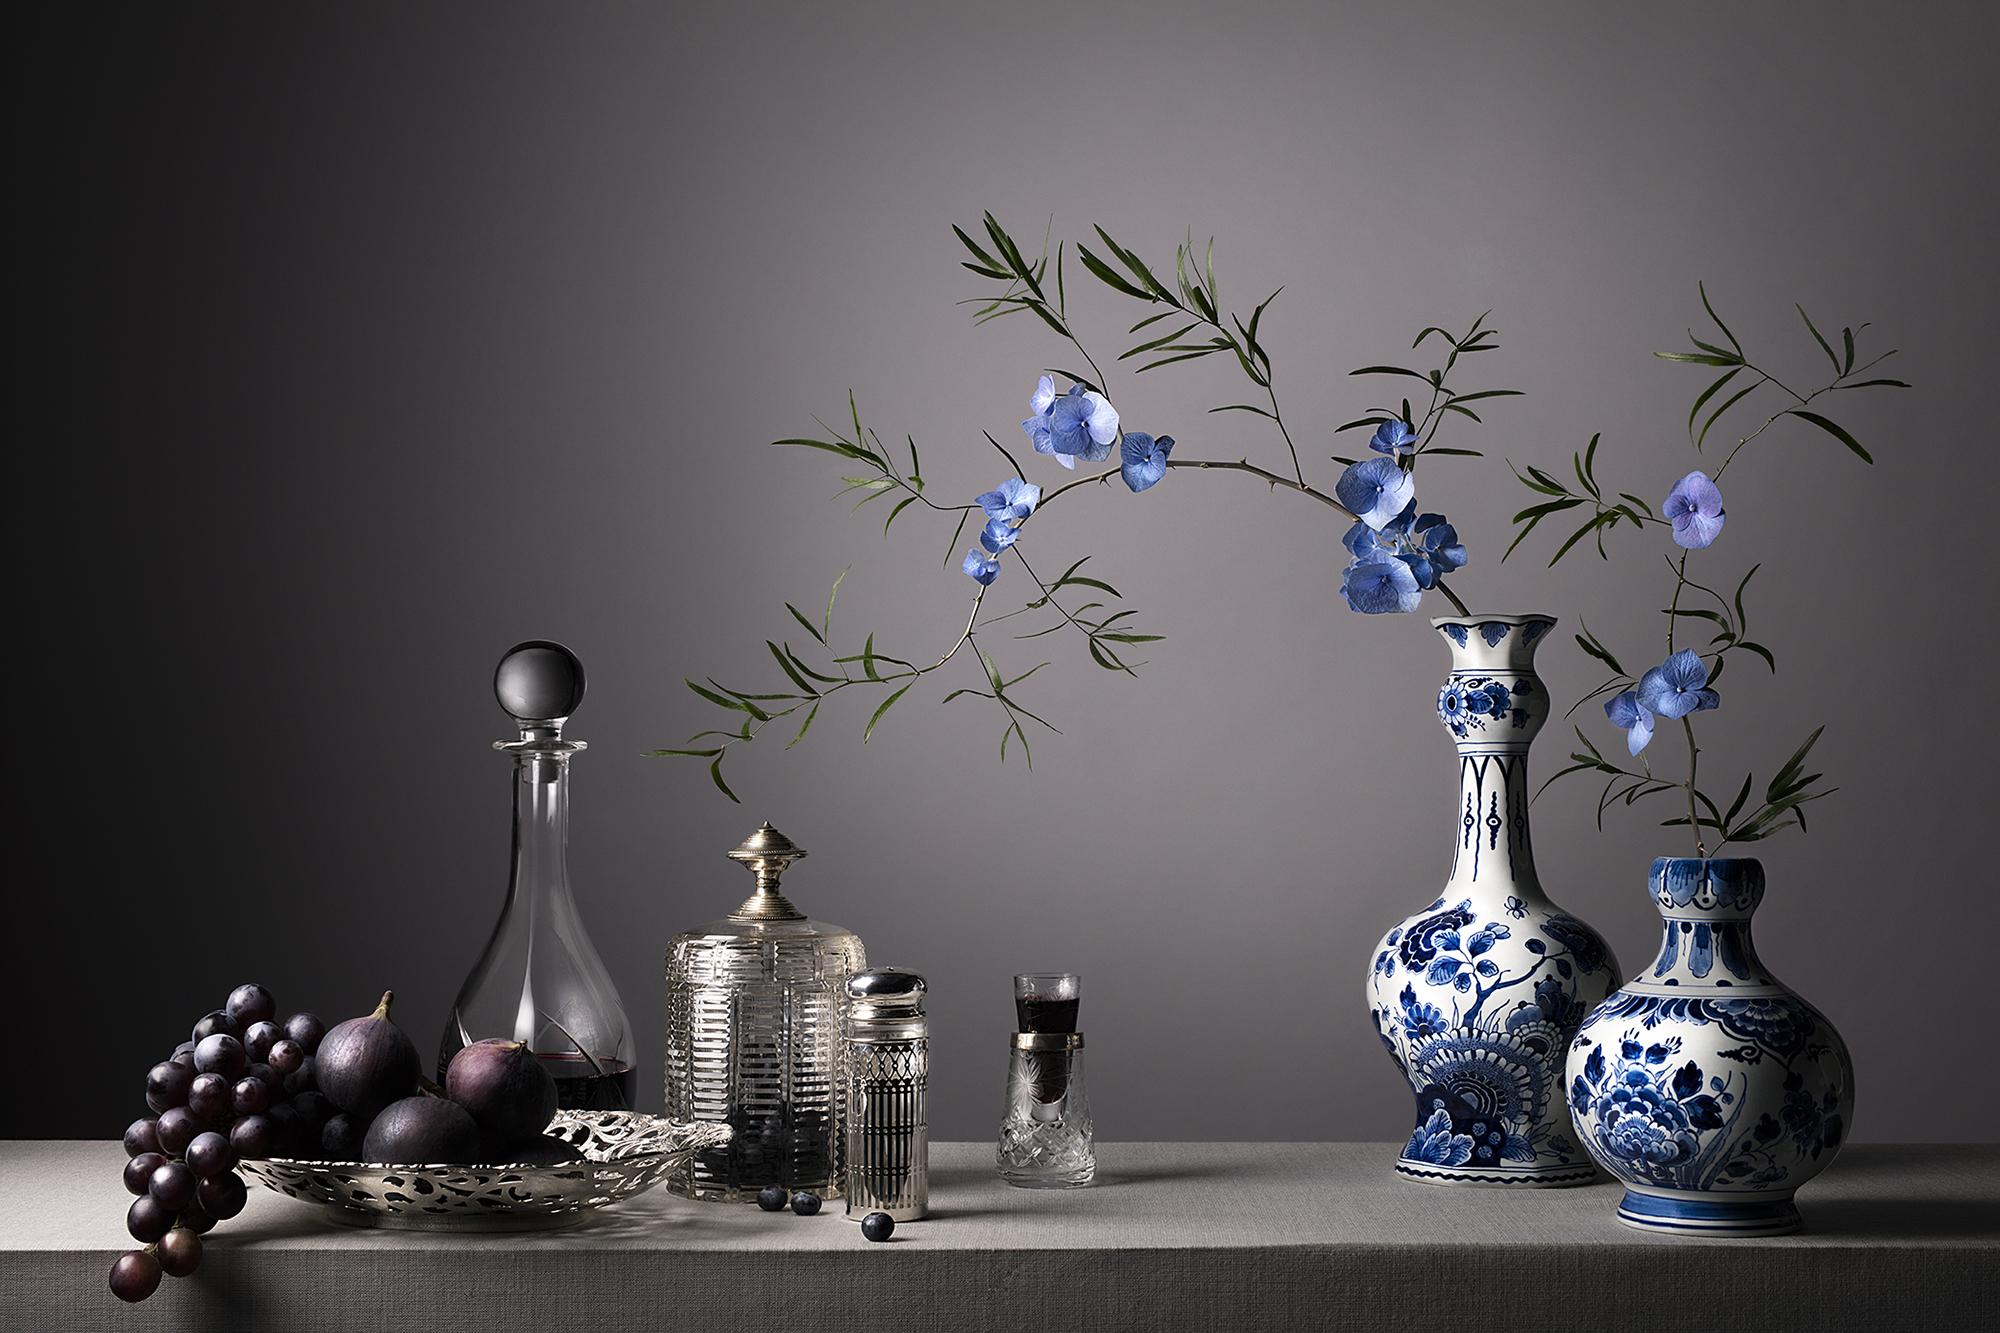 Blauwe Nacht  | 150 x 100 cm | 120 x 80 cm | 90 x 60 cm  |  Total Edition 5